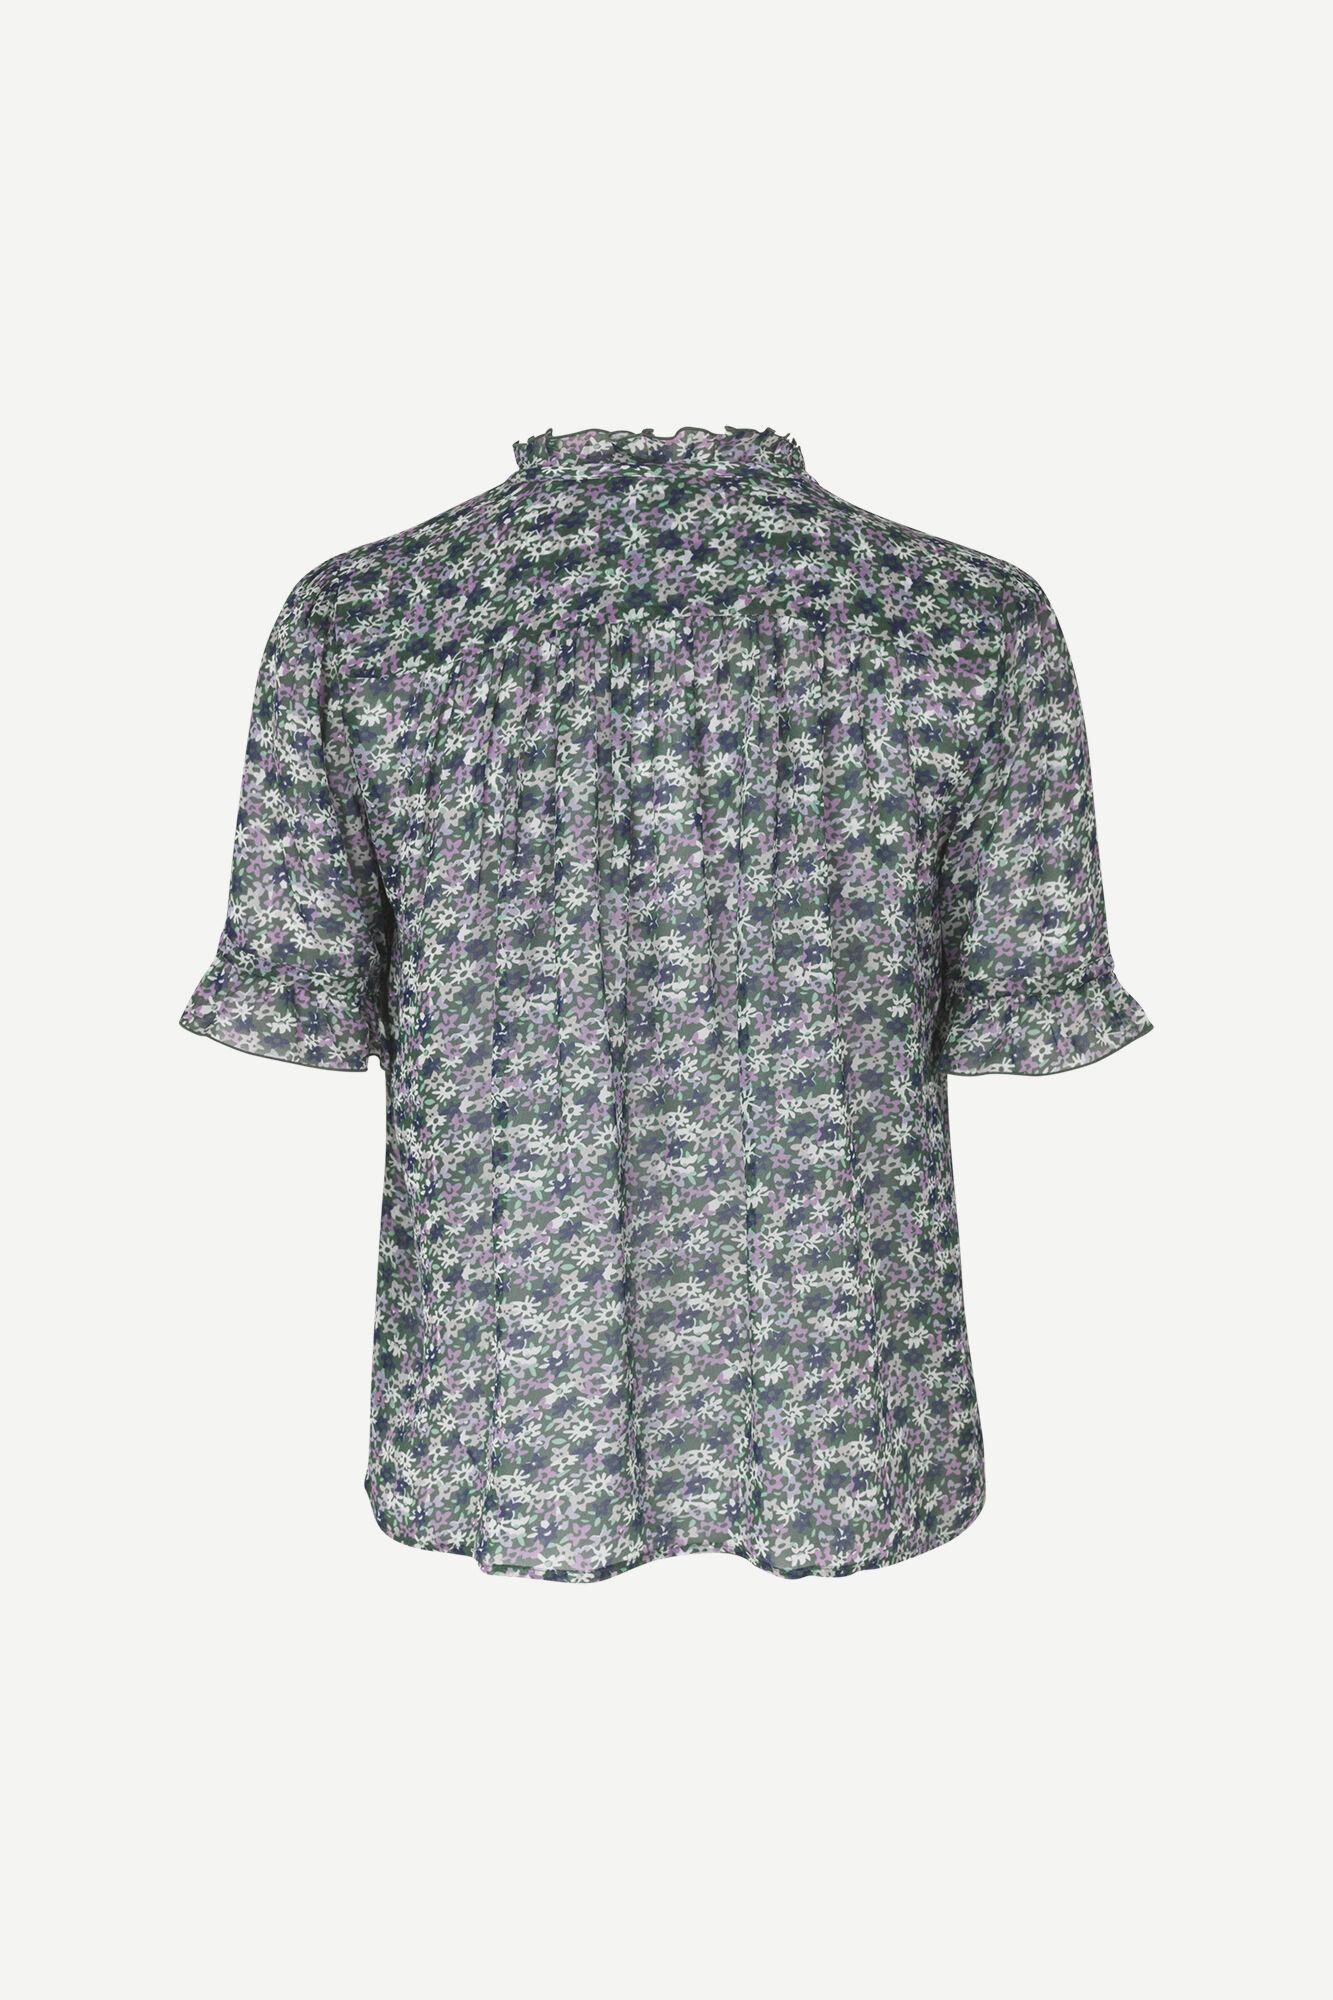 Rosella shirt aop 9695